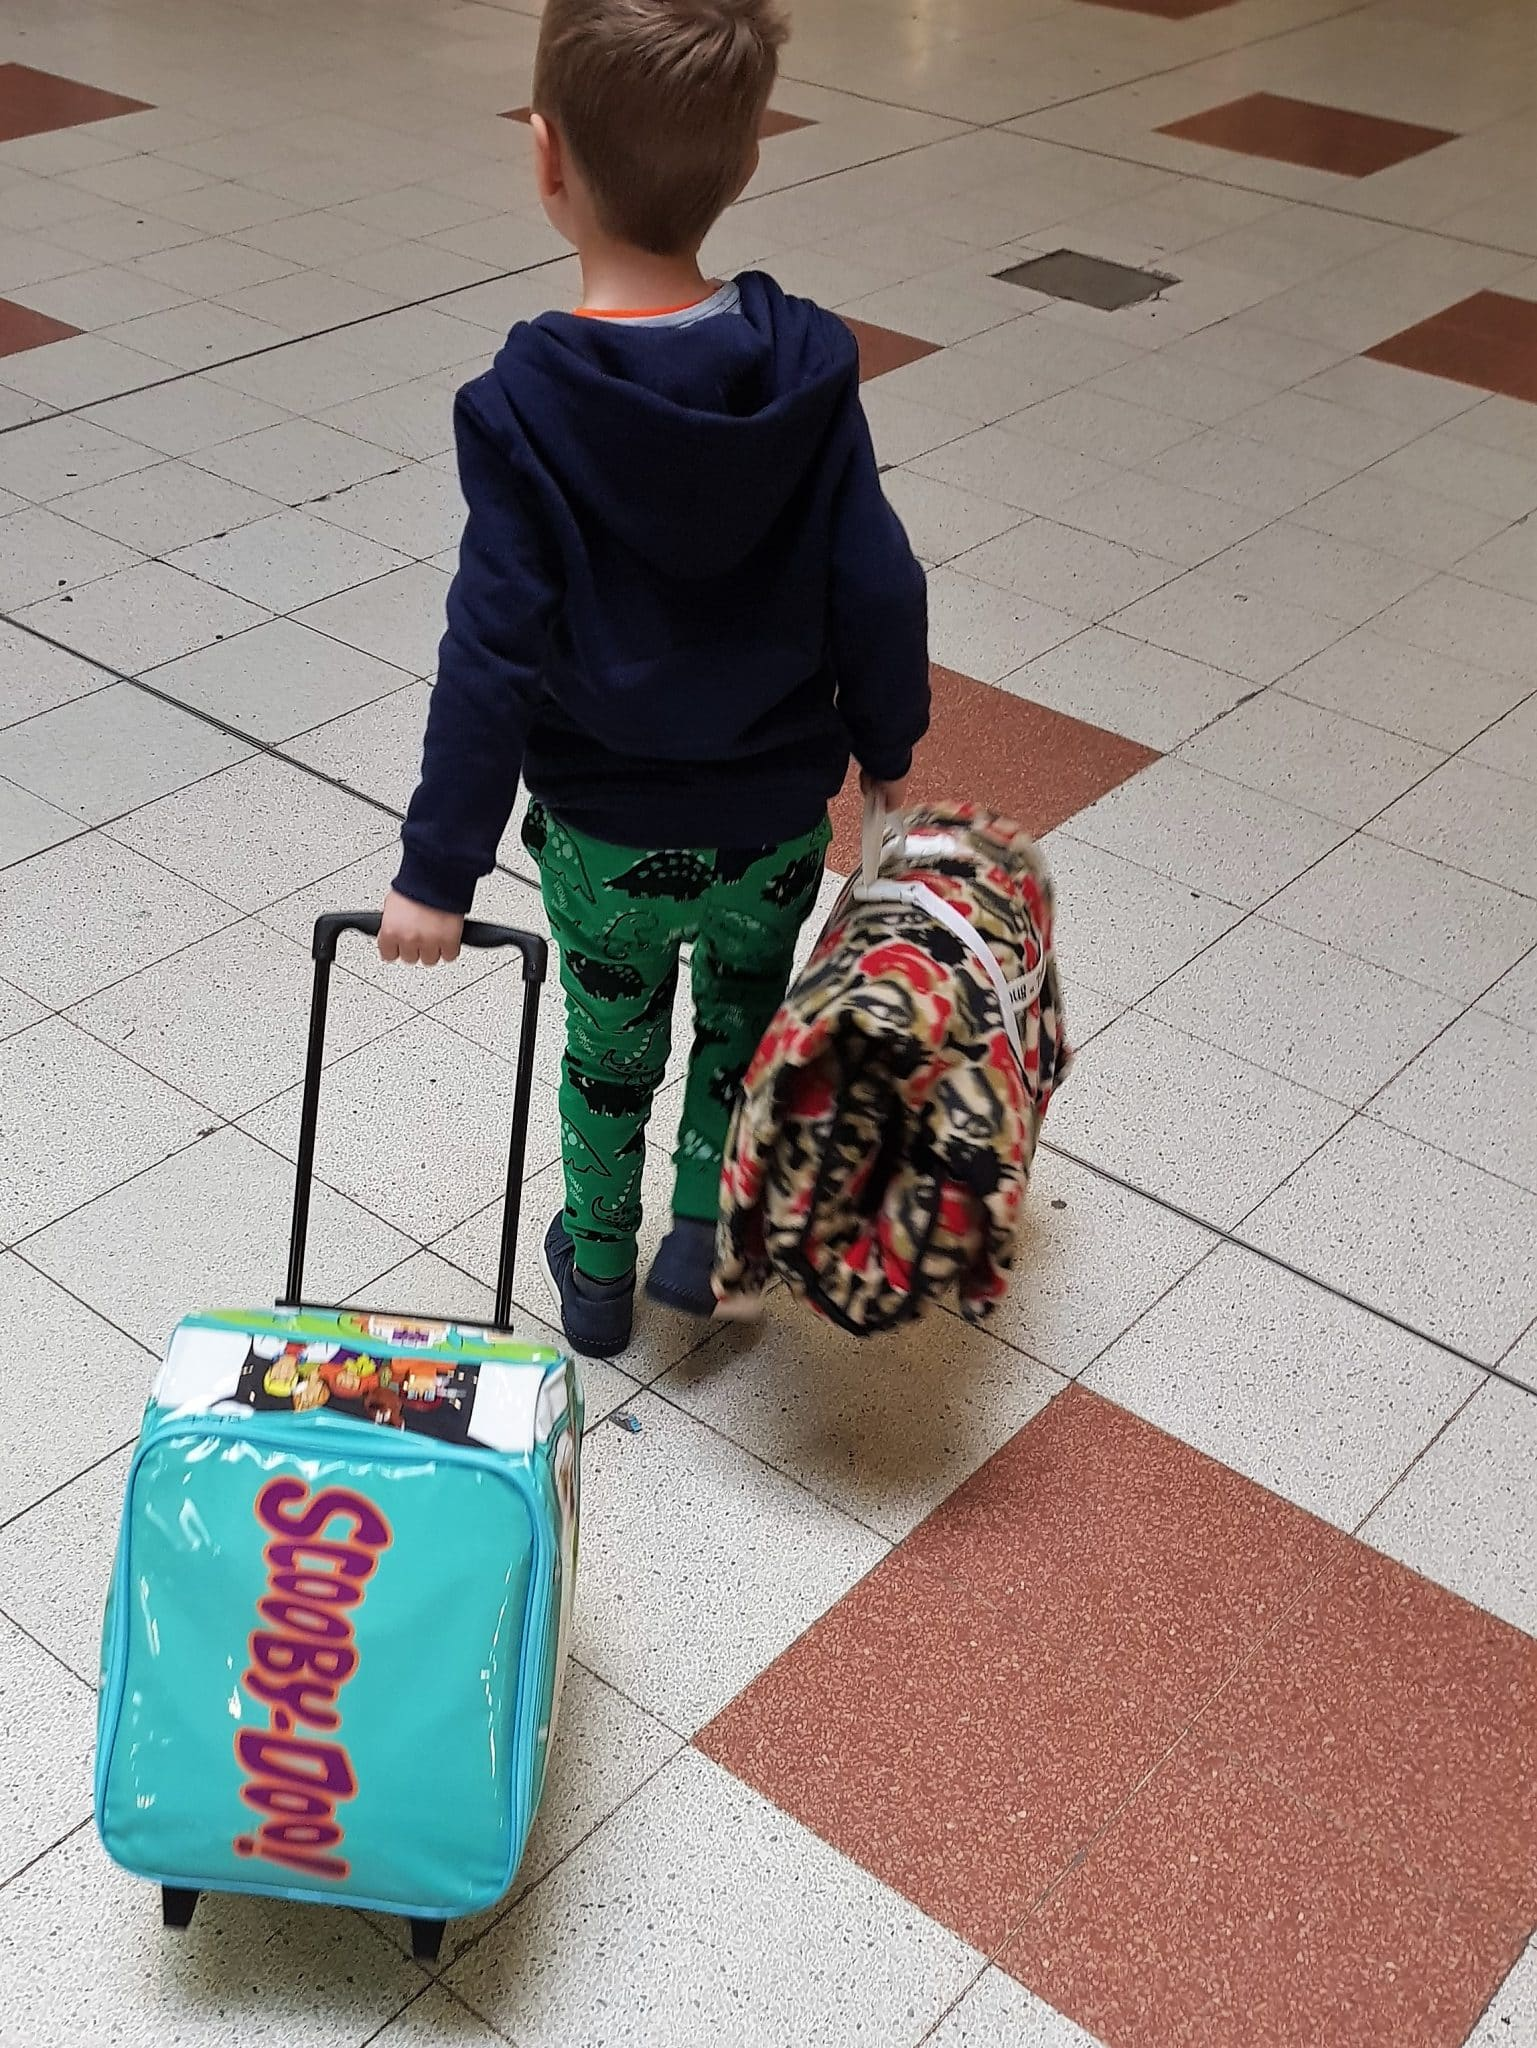 Flying Virgin Atlantic with Kids | Long Haul Economy Review